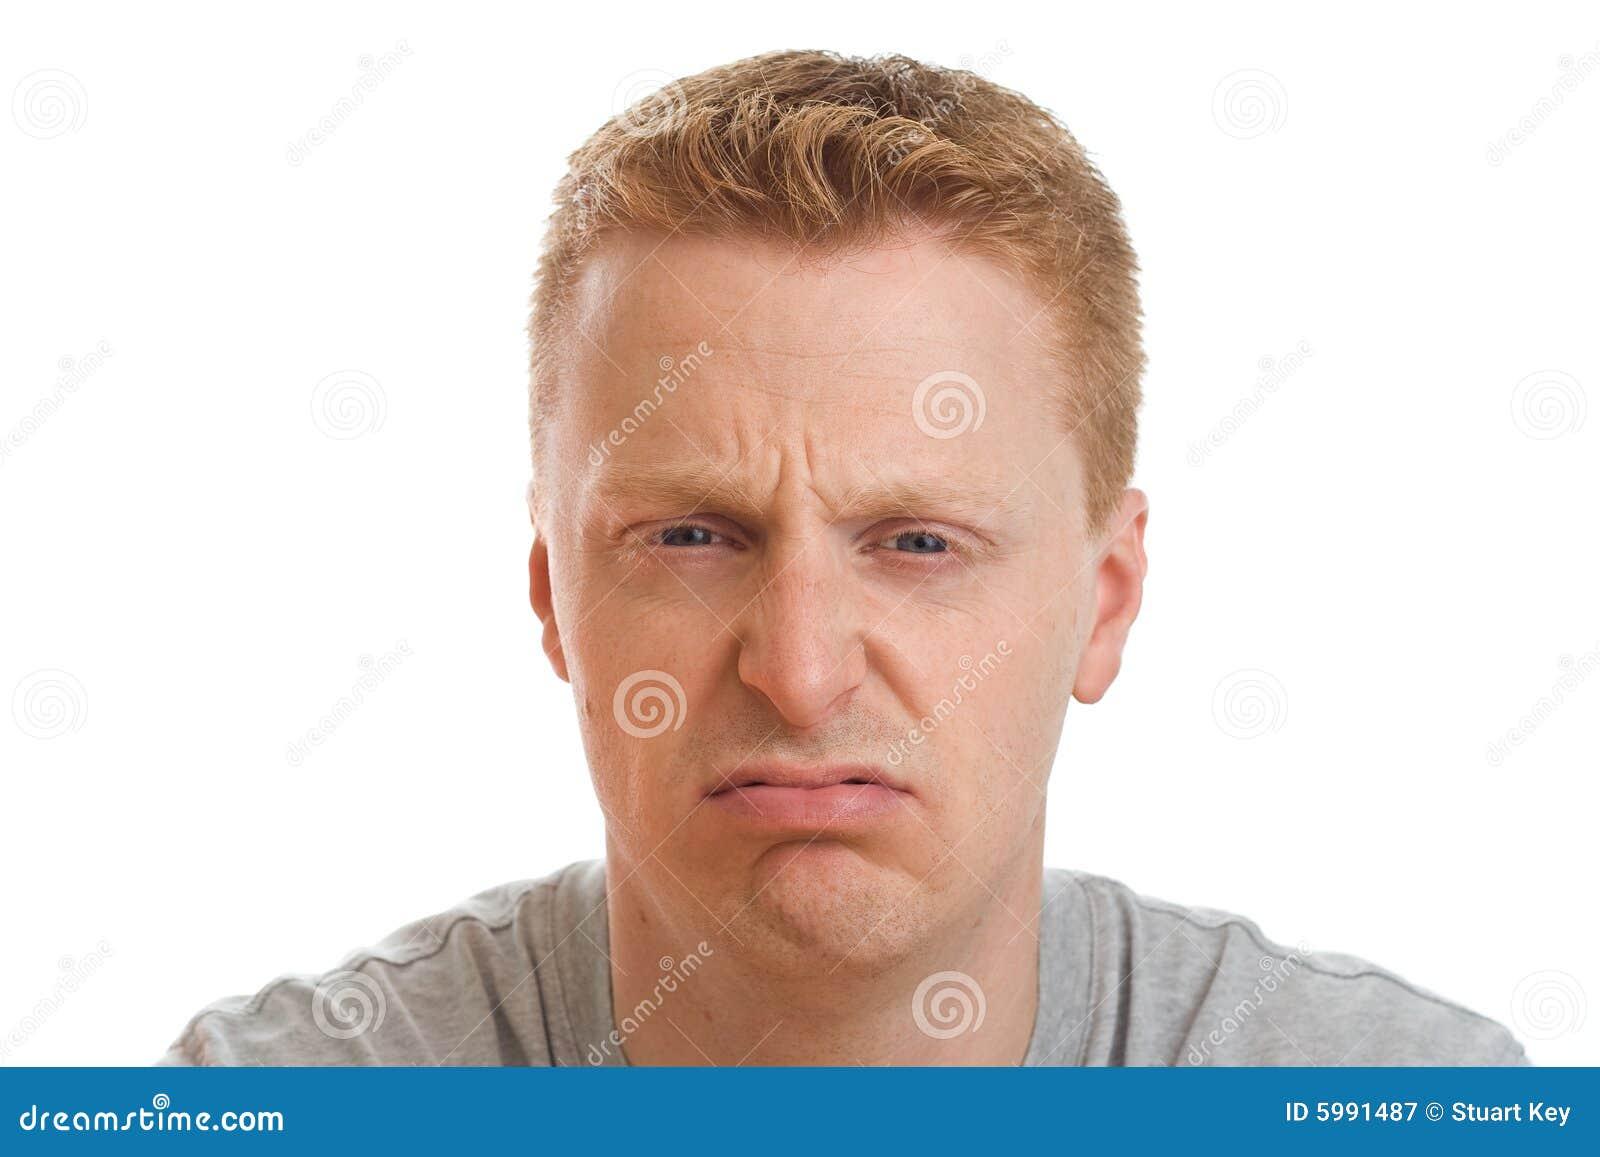 Unhappy man portrait